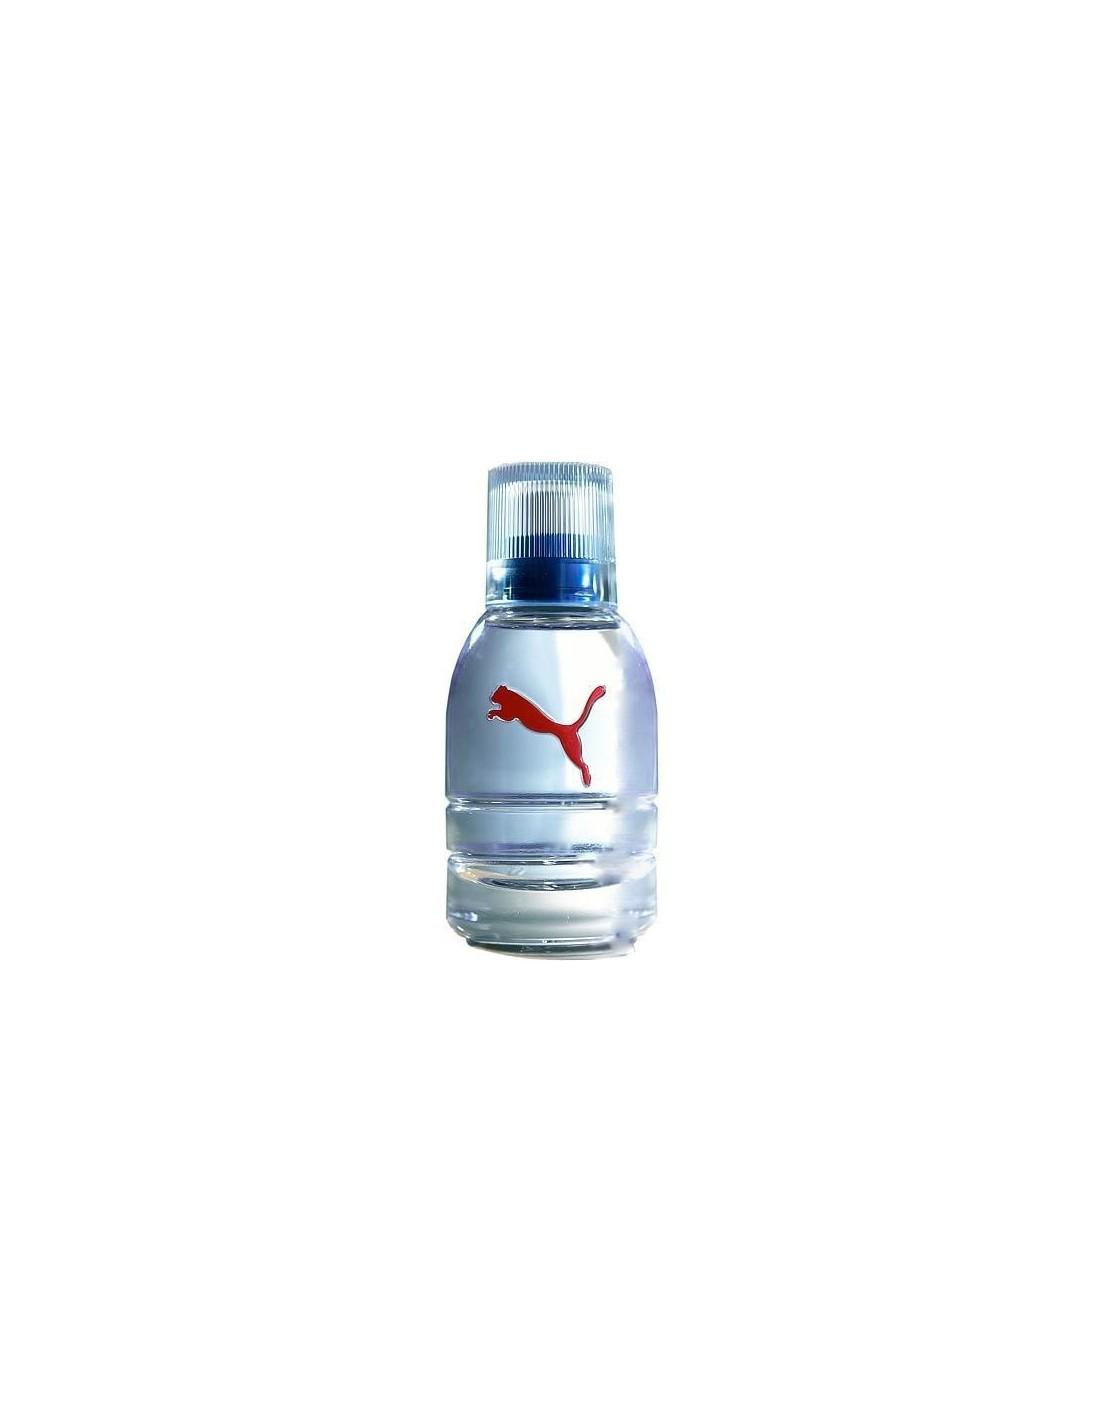 Puma White Man Eau de Toilette 50 ml Spray TESTER